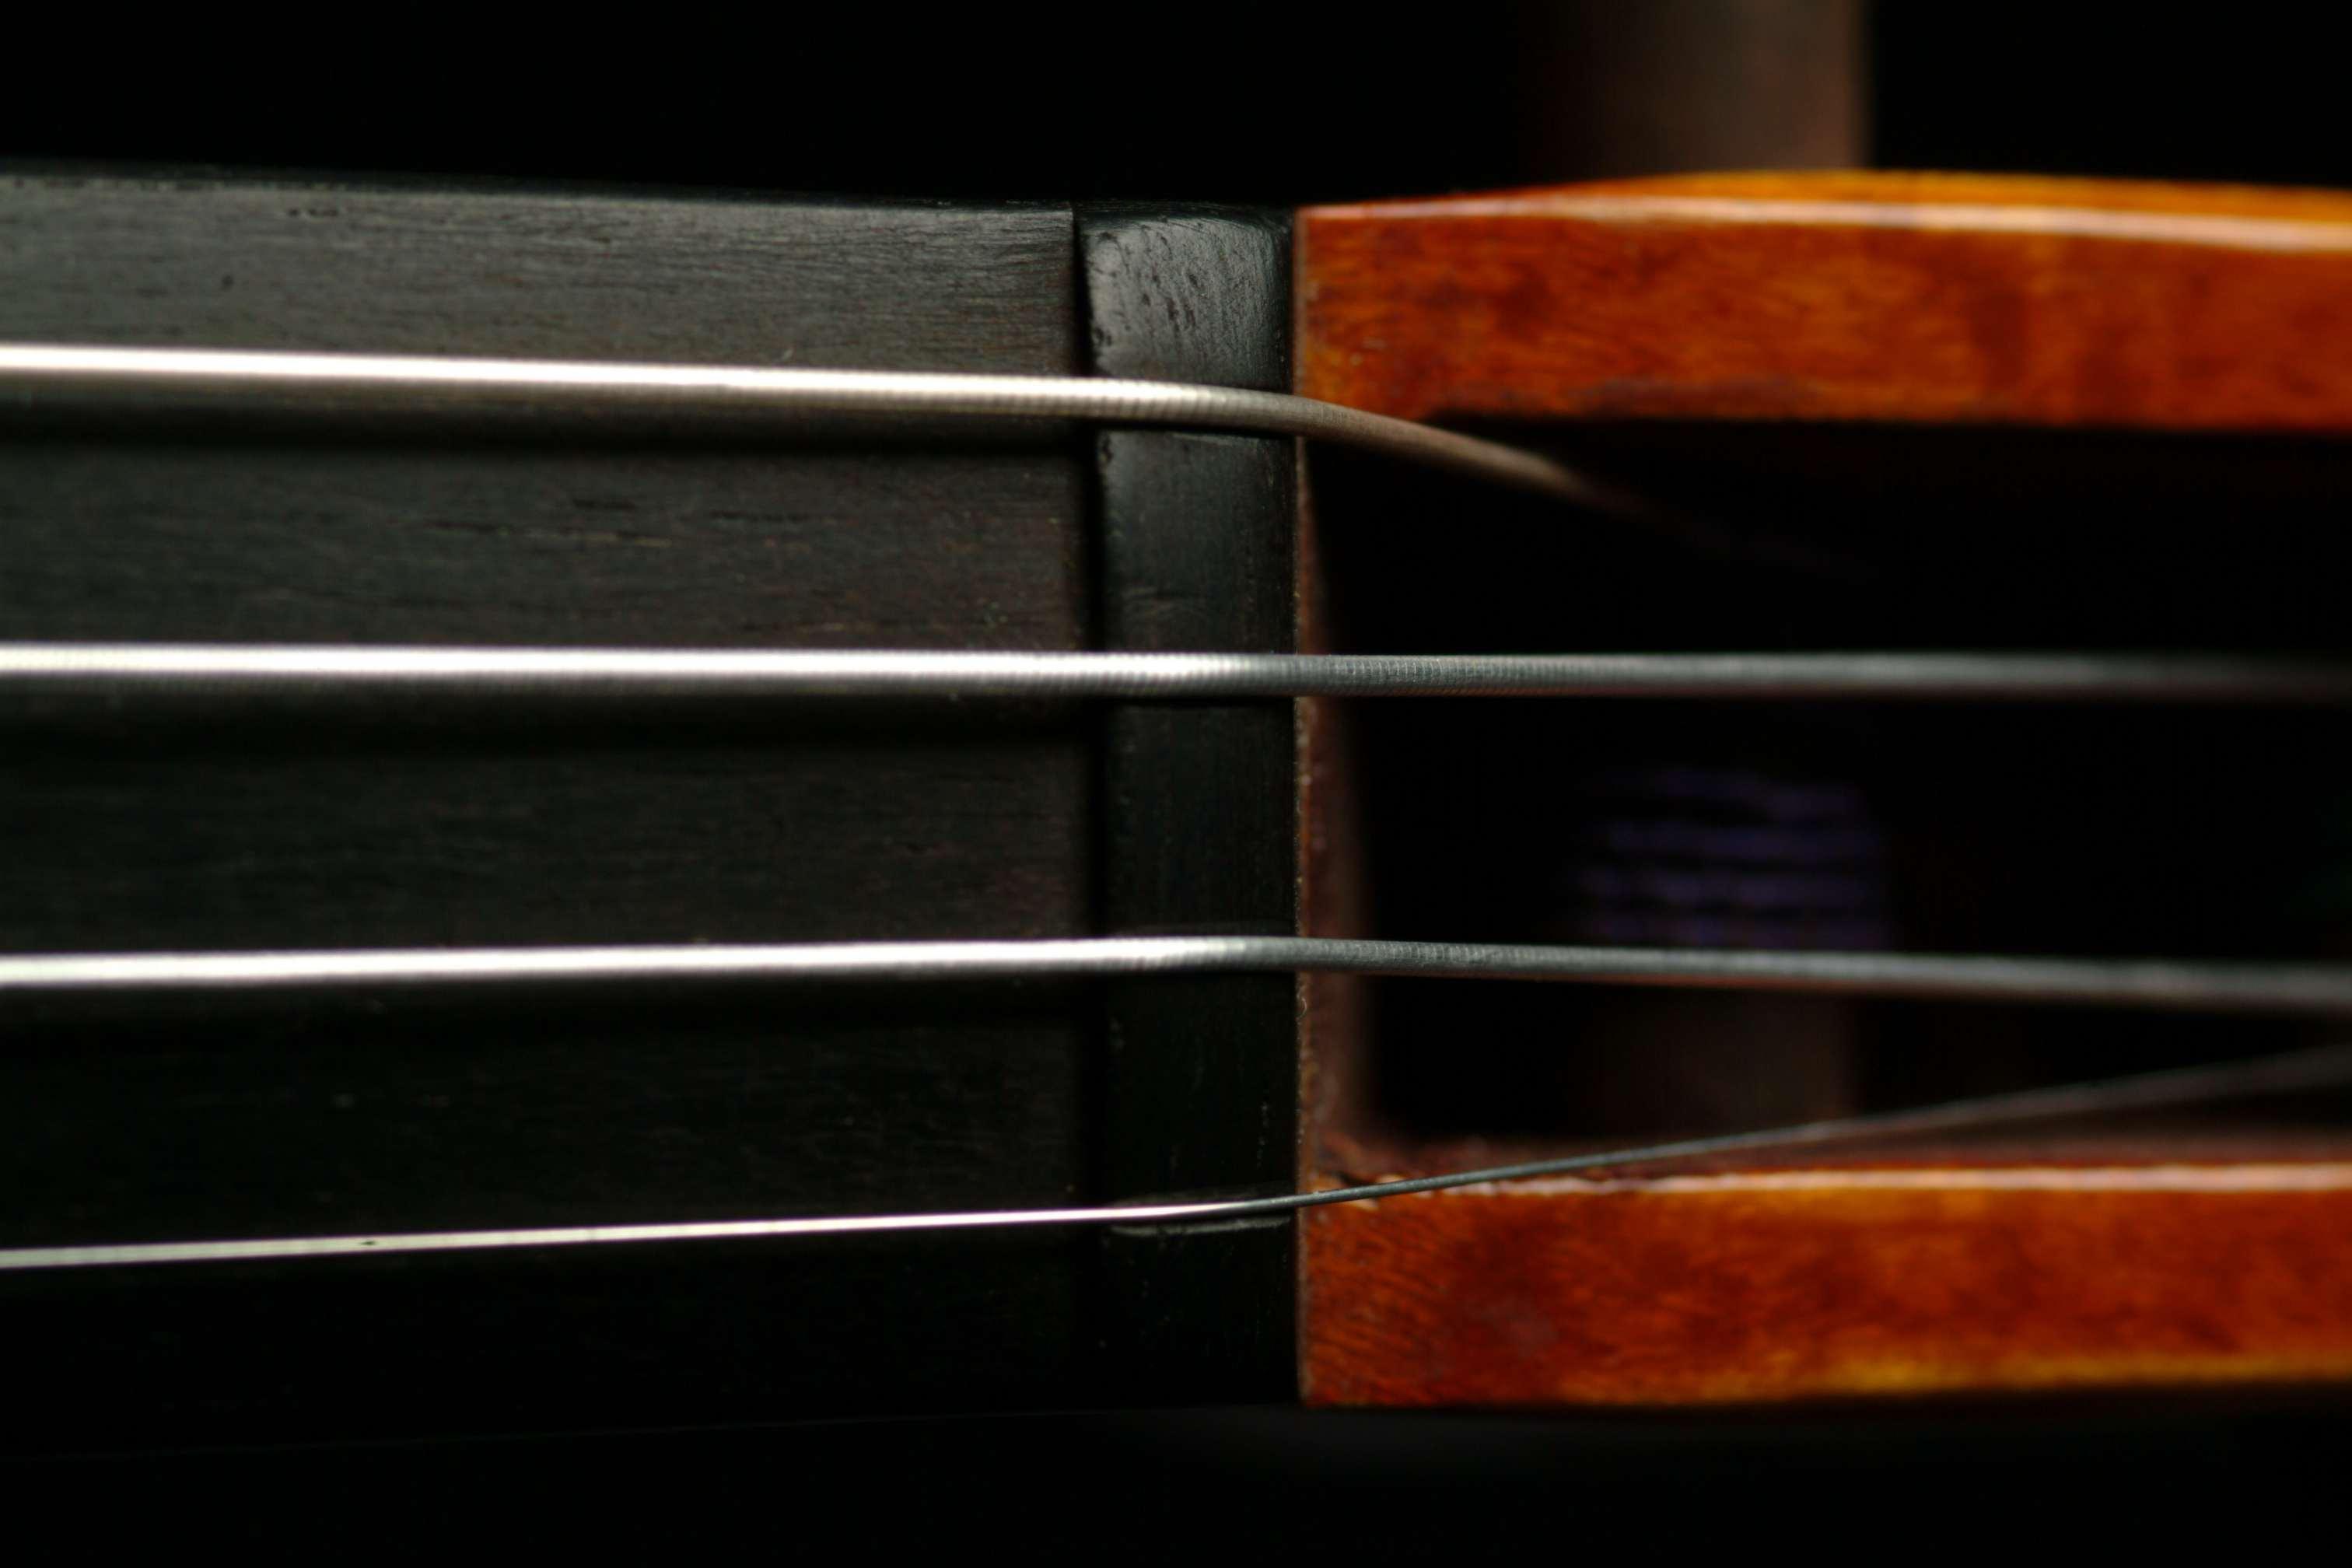 Violin fingerboard nut with strings